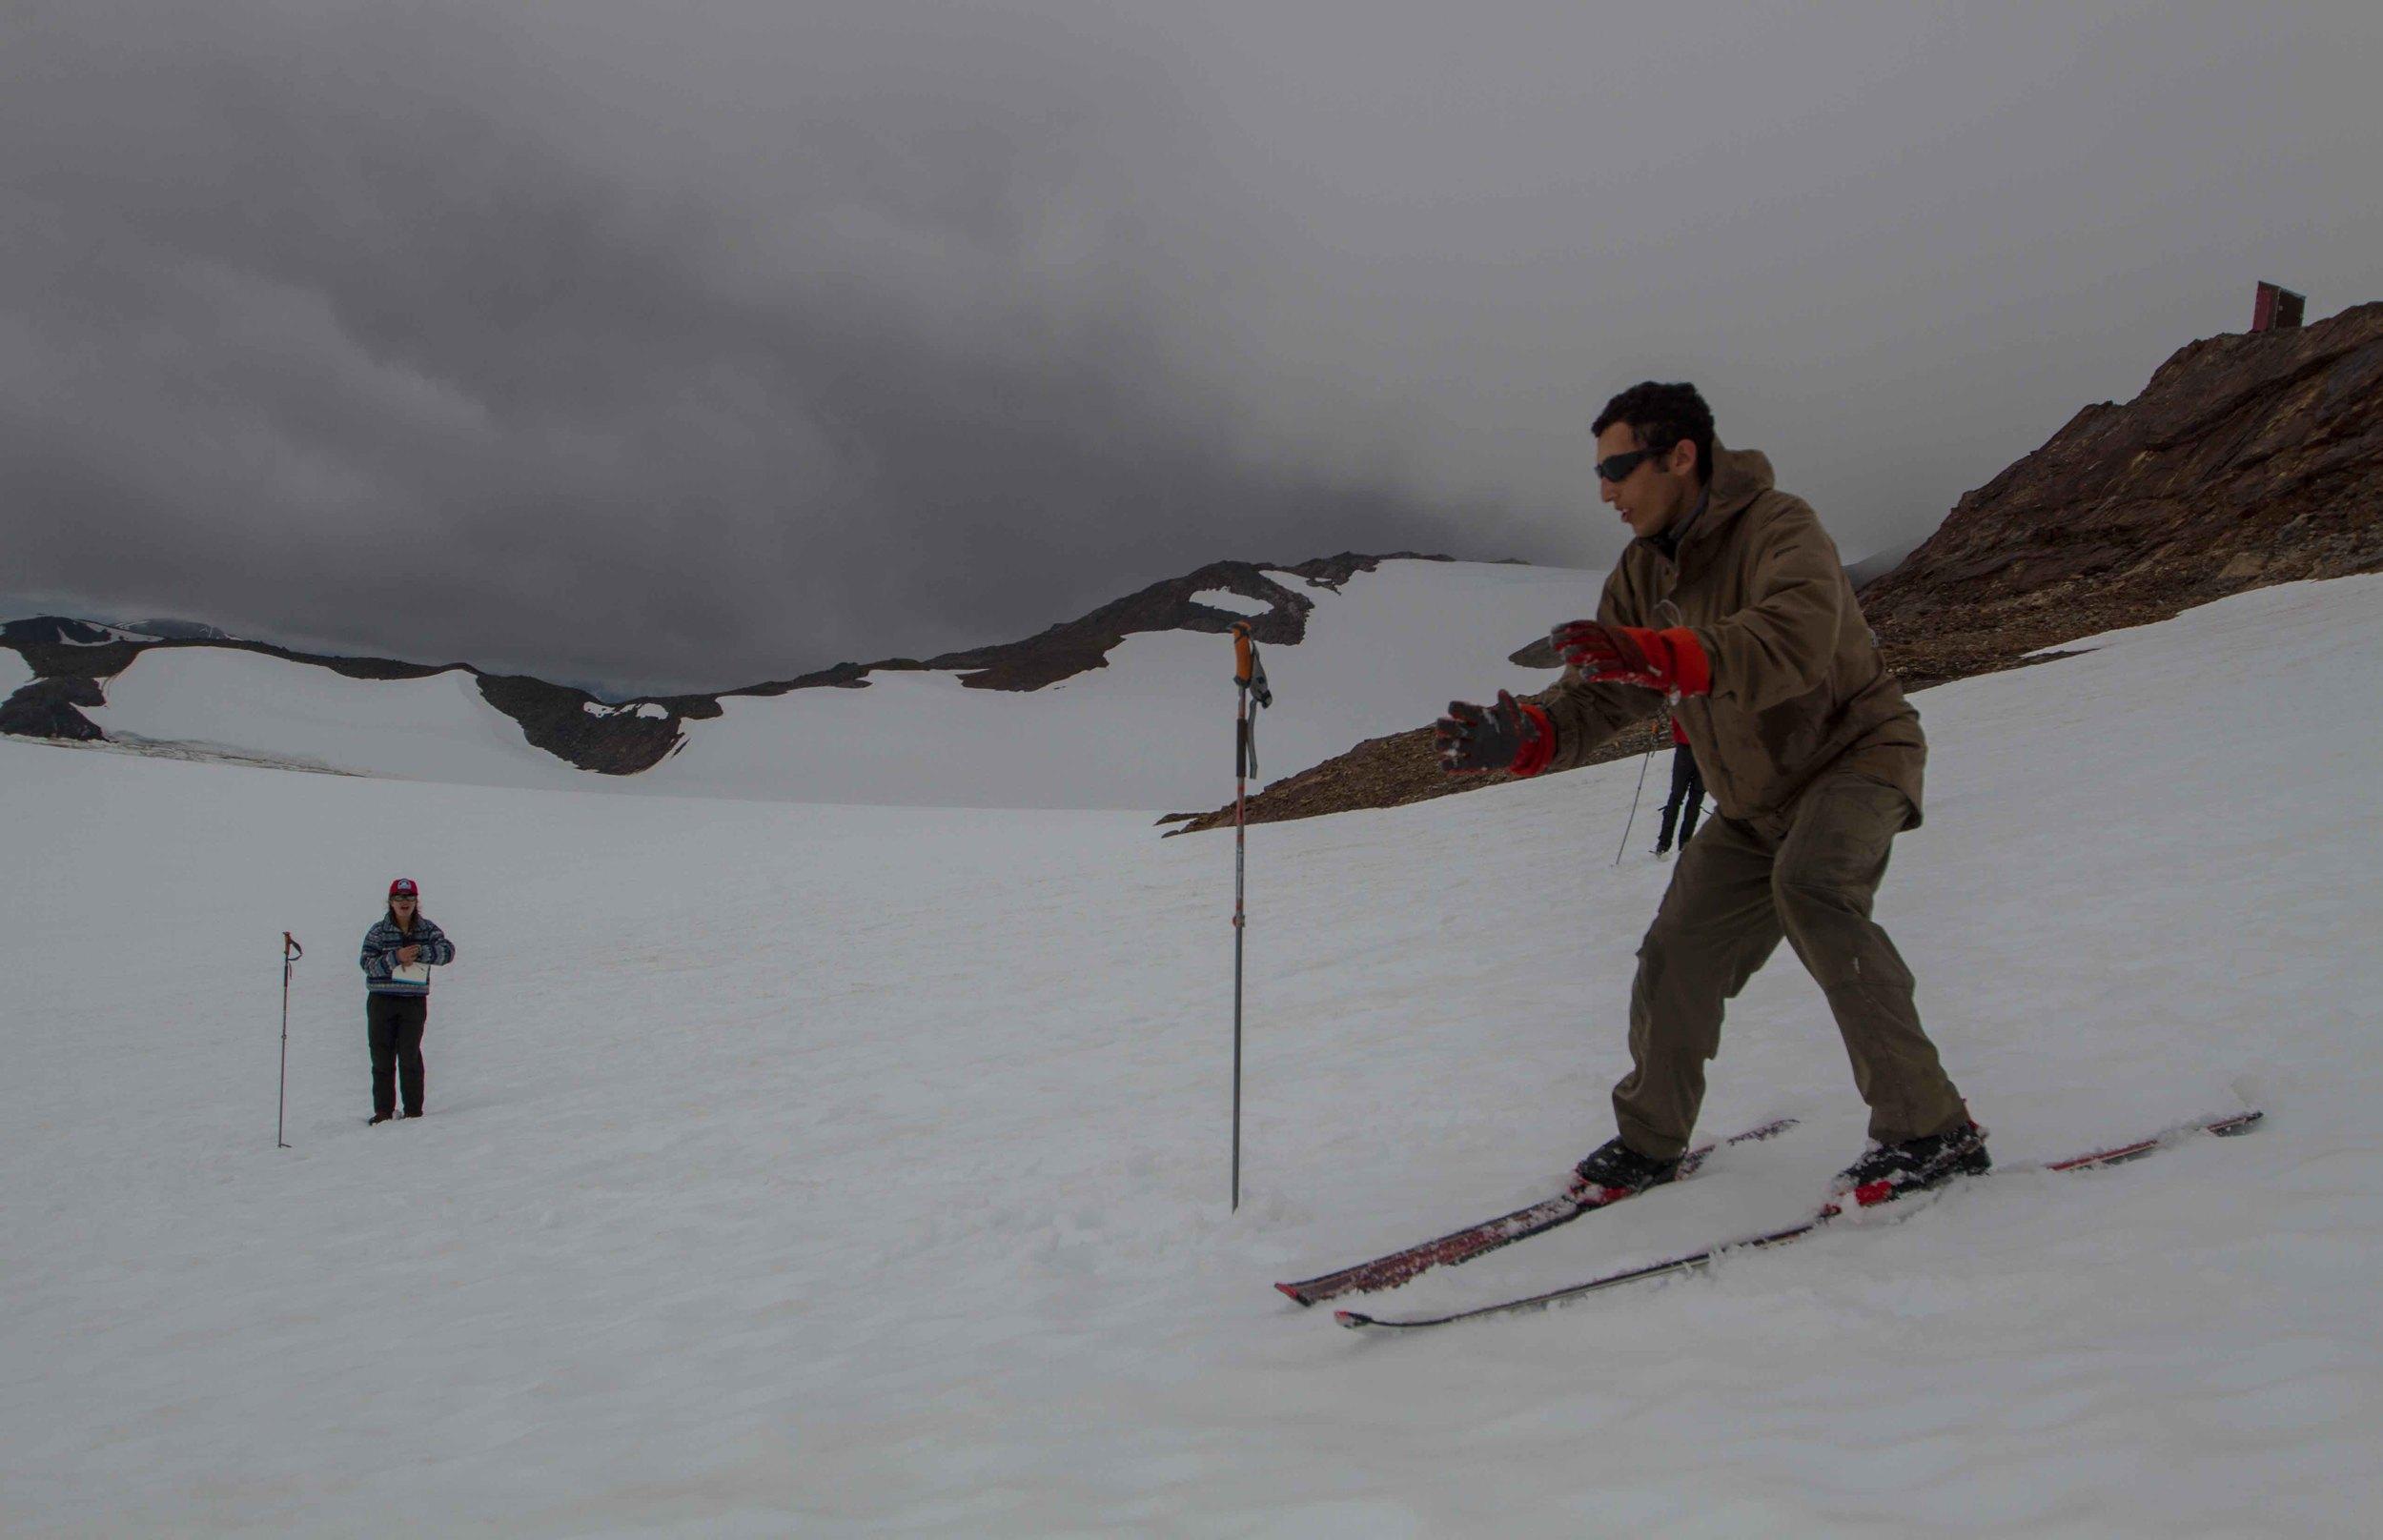 Kamil Chadirji-Martinez comes down the hill while Kate Baustian times. Photo by Adam Taylor